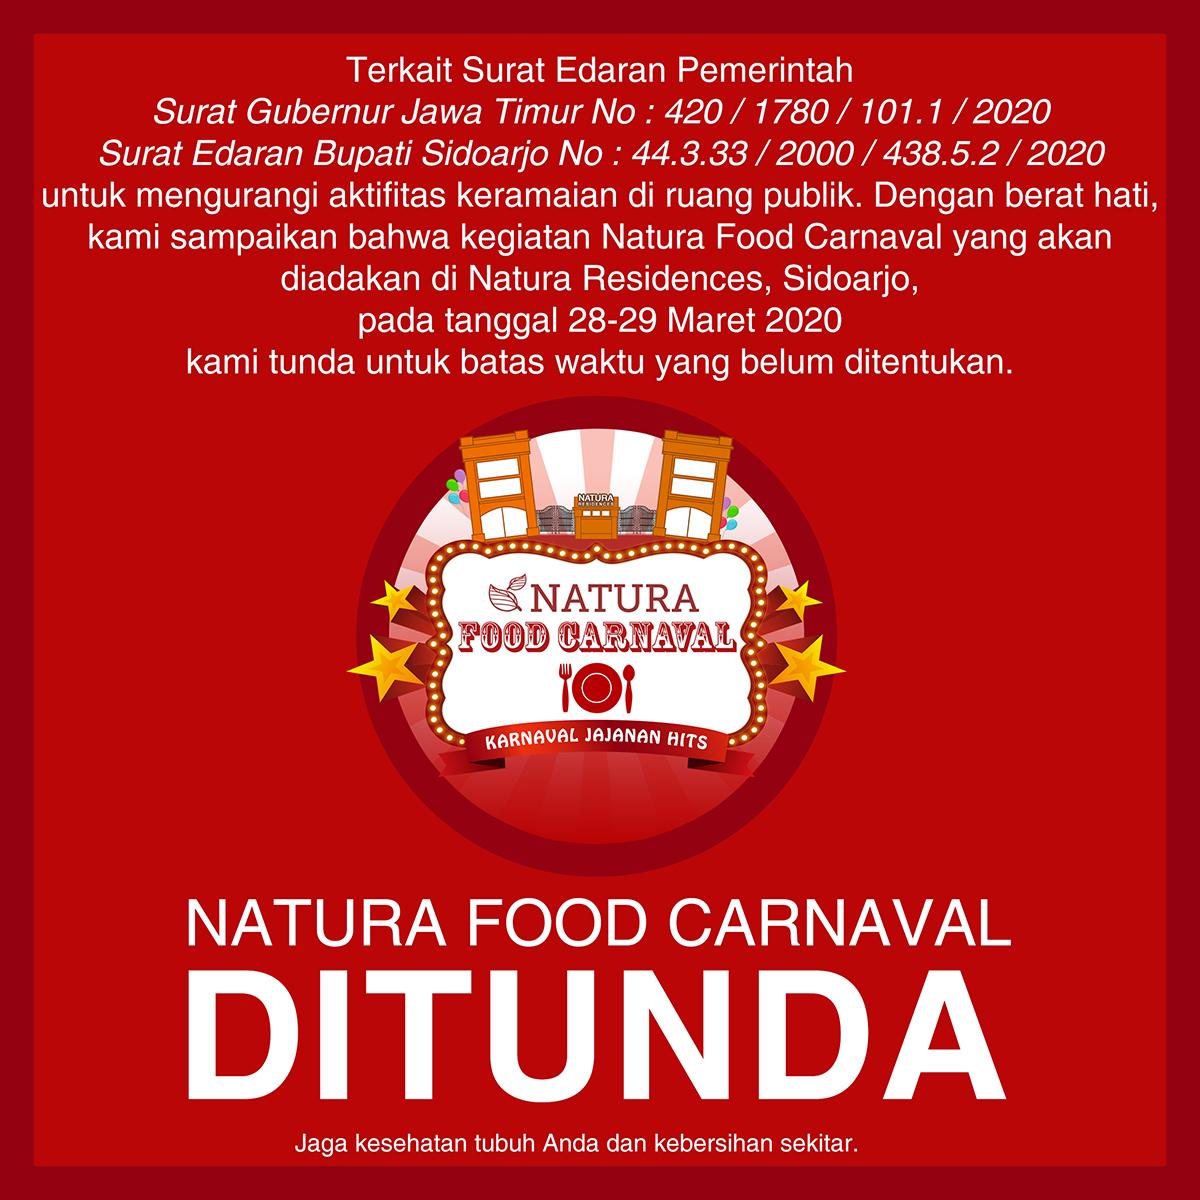 Natura Food Carnaval DITUNDA